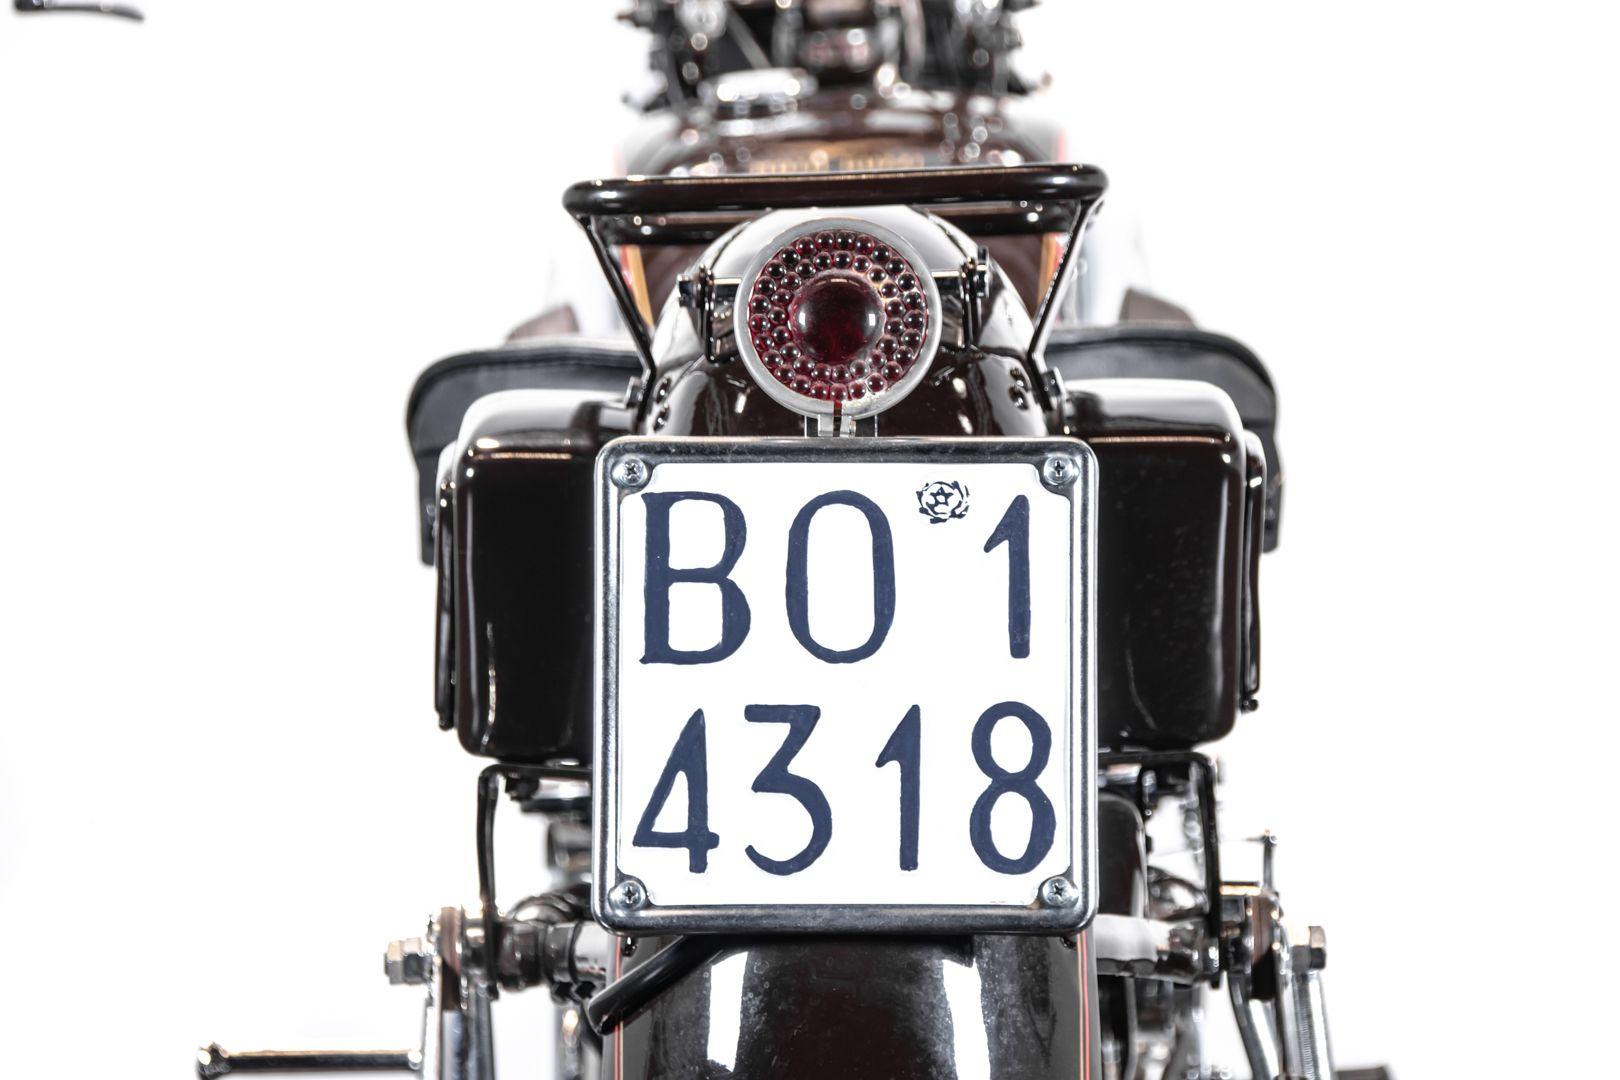 1951 Moto Guzzi 500 72183